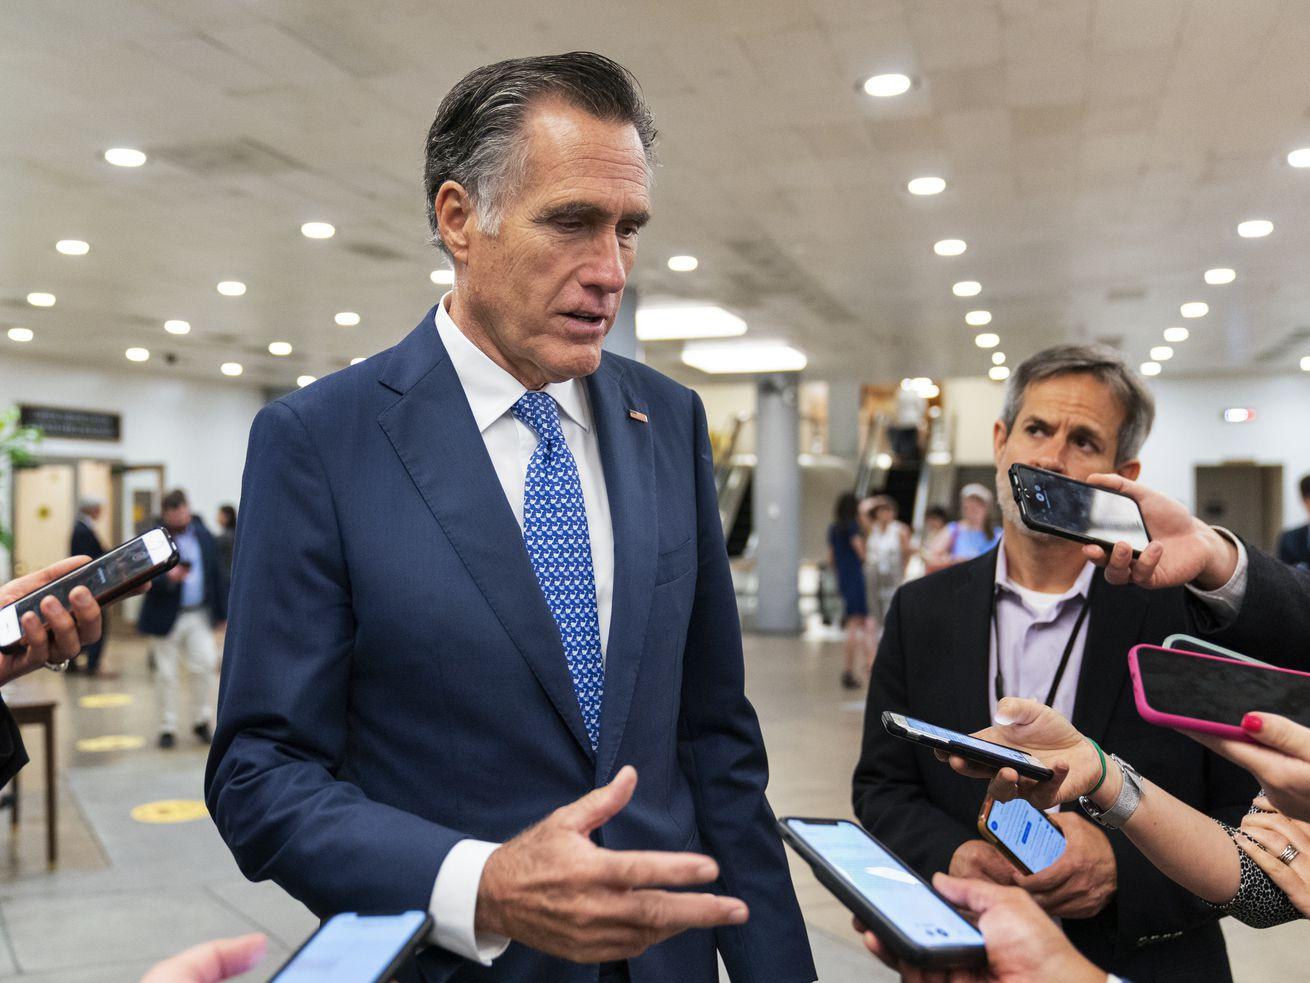 Sen. Mitt Romney, R-Utah, speaks to reporters as he walks on the Senate subway on Capitol Hill.